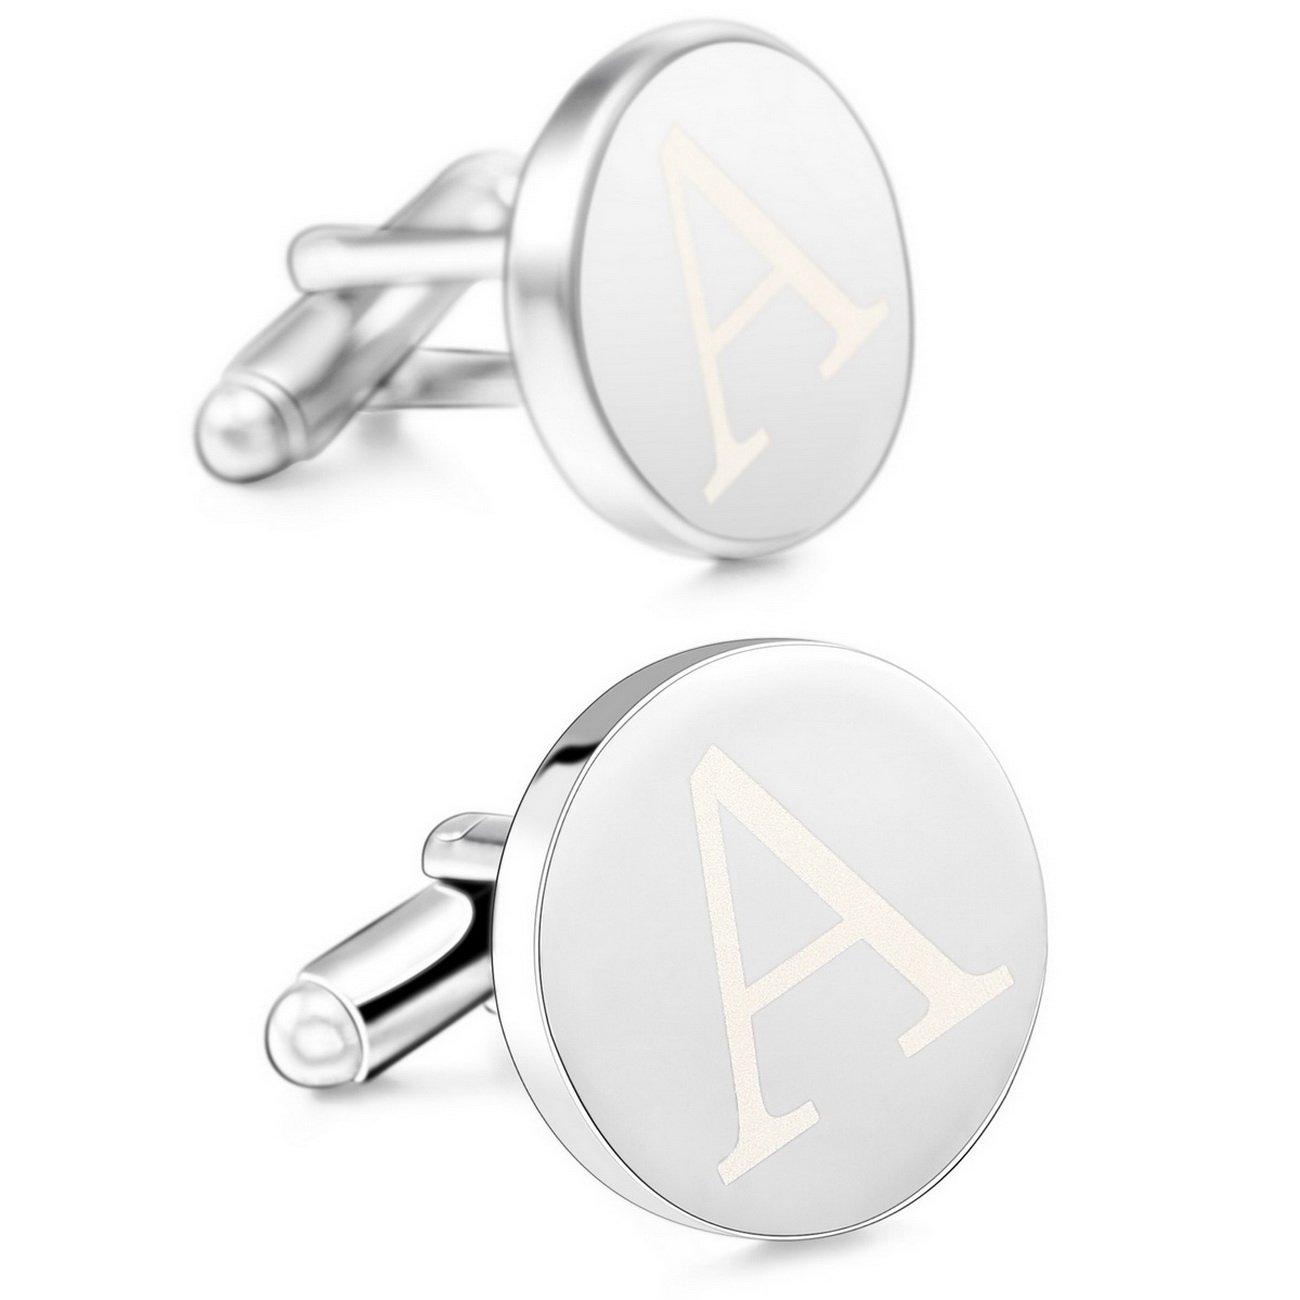 MOWOM Silver Tone 2PCS Rhodium Plated Cufflinks Initial Letter Capital Alphabet Shirt Wedding Set ca5050116